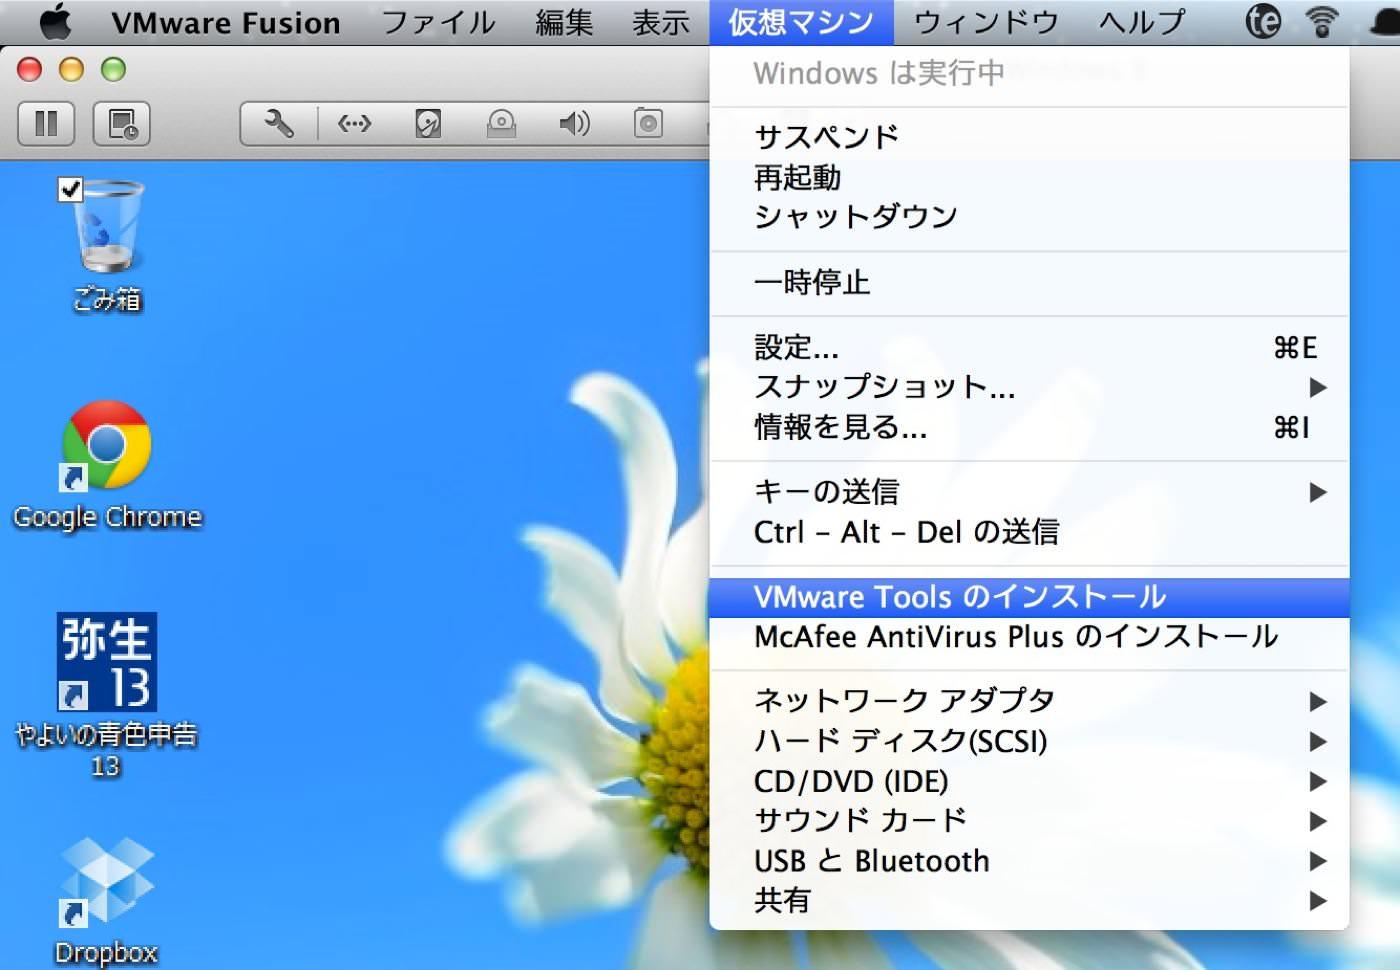 VMware Fusionのメニューバー内にある仮想マシンのメニュー